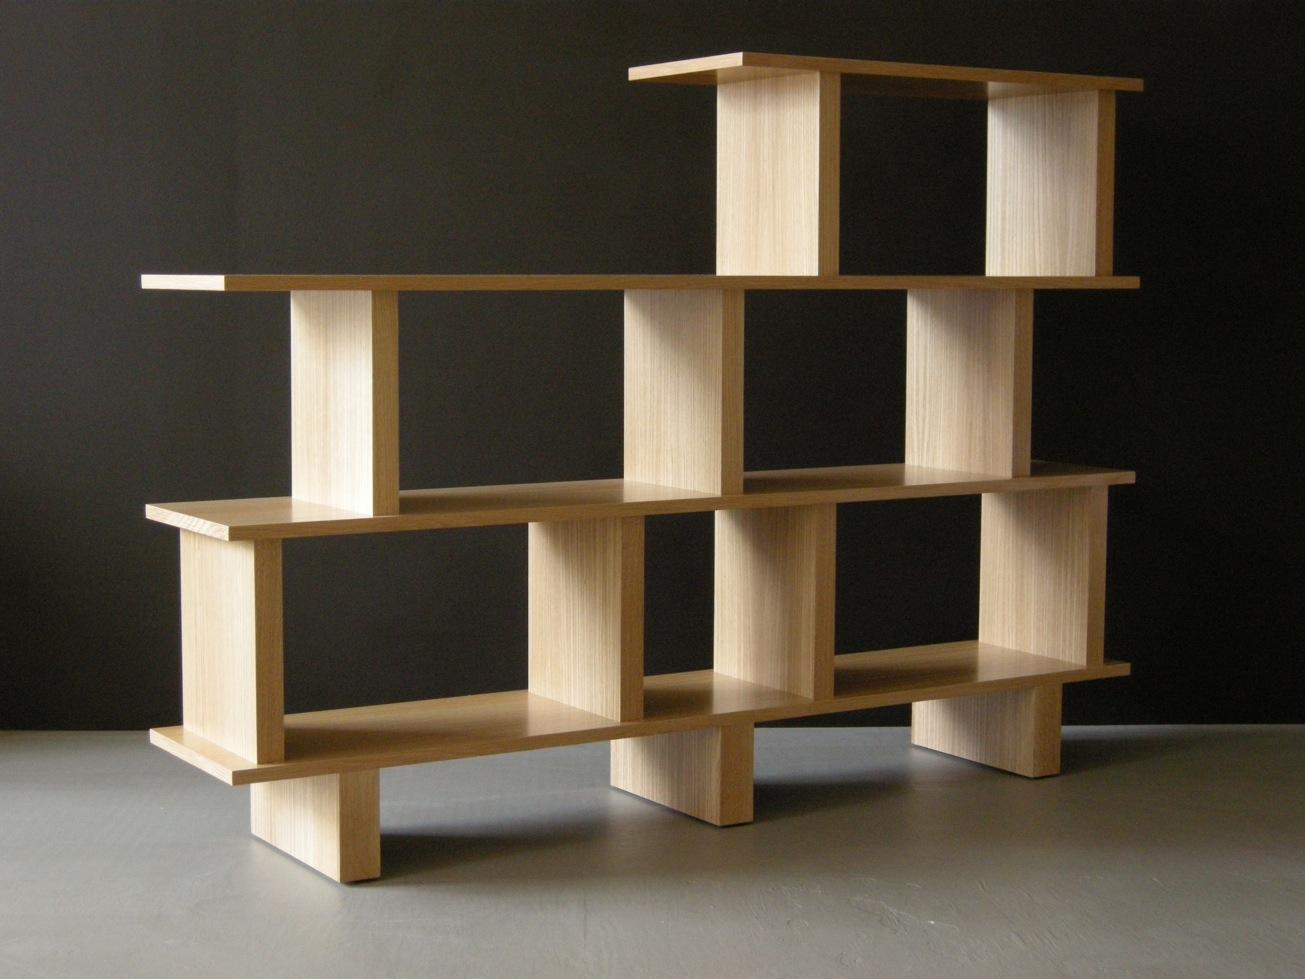 Bookshelf Room Divider Ideas 1305 x 979